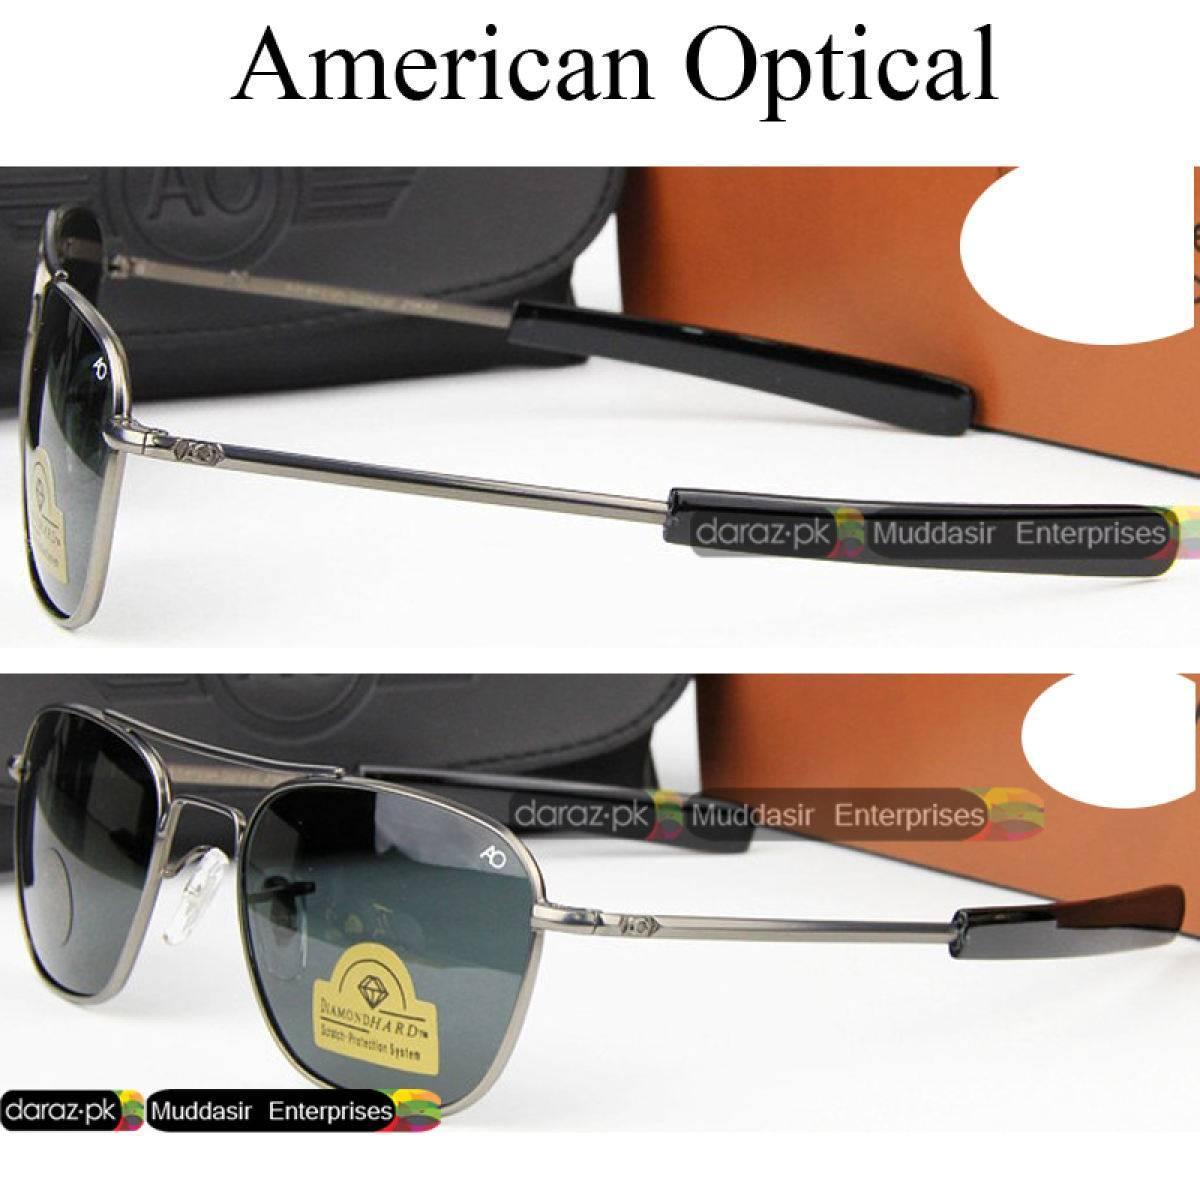 Imported High Quality Original AO American Optical Fashion Classical Aviation Sunglasses Men & Women AO Sun Glasses For Male American Army Military Optical Glass Lens